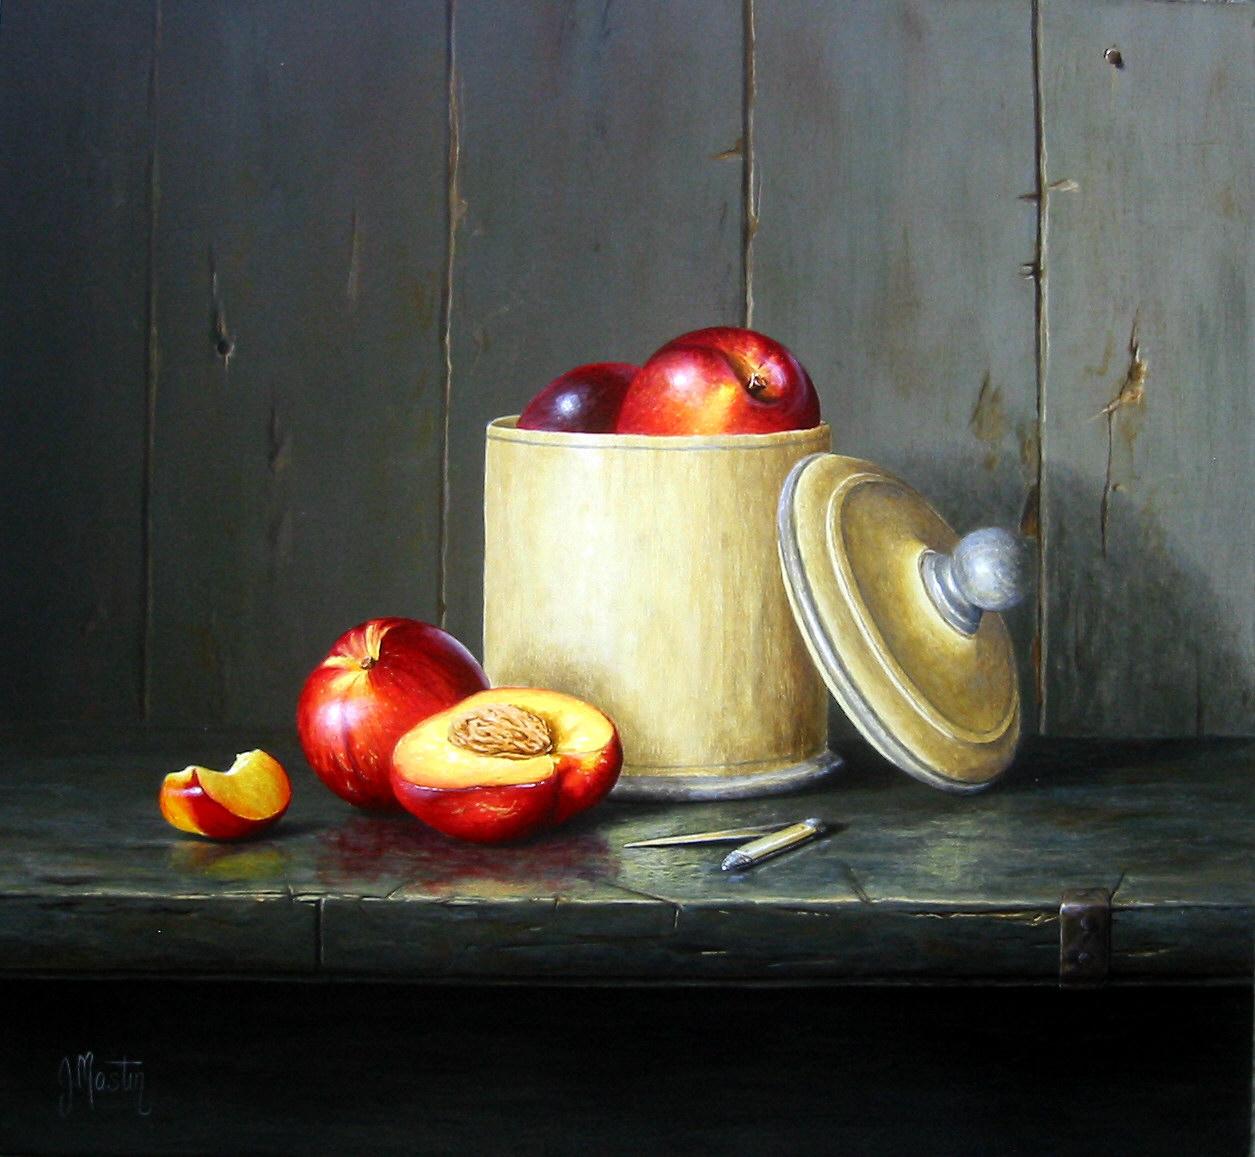 A Piece of Fruit for Dessert